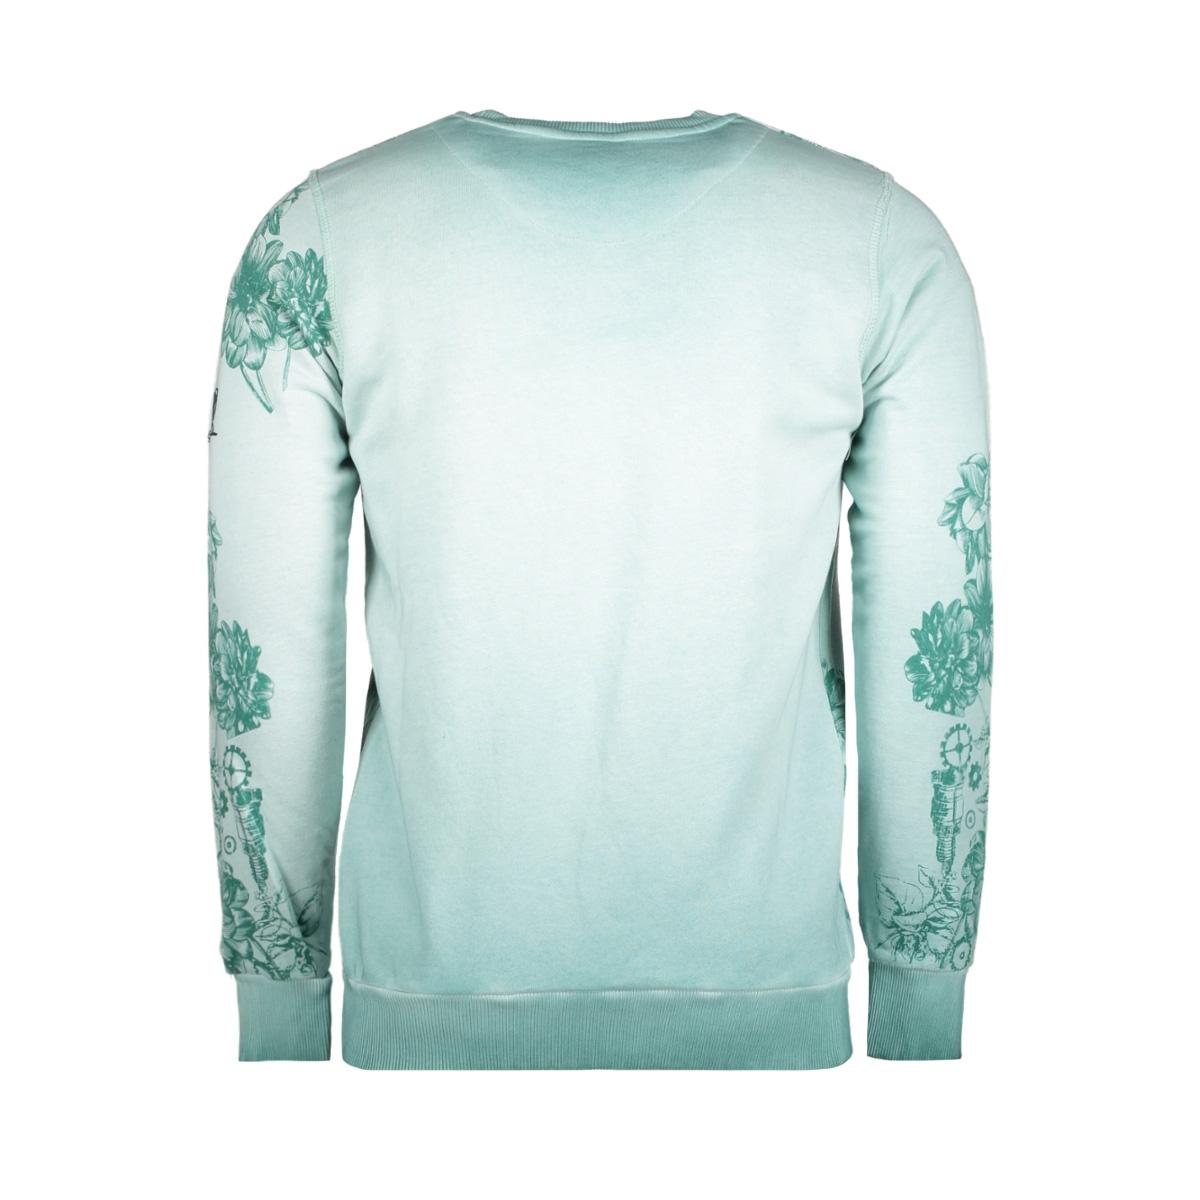 76129 gabbiano sweater green